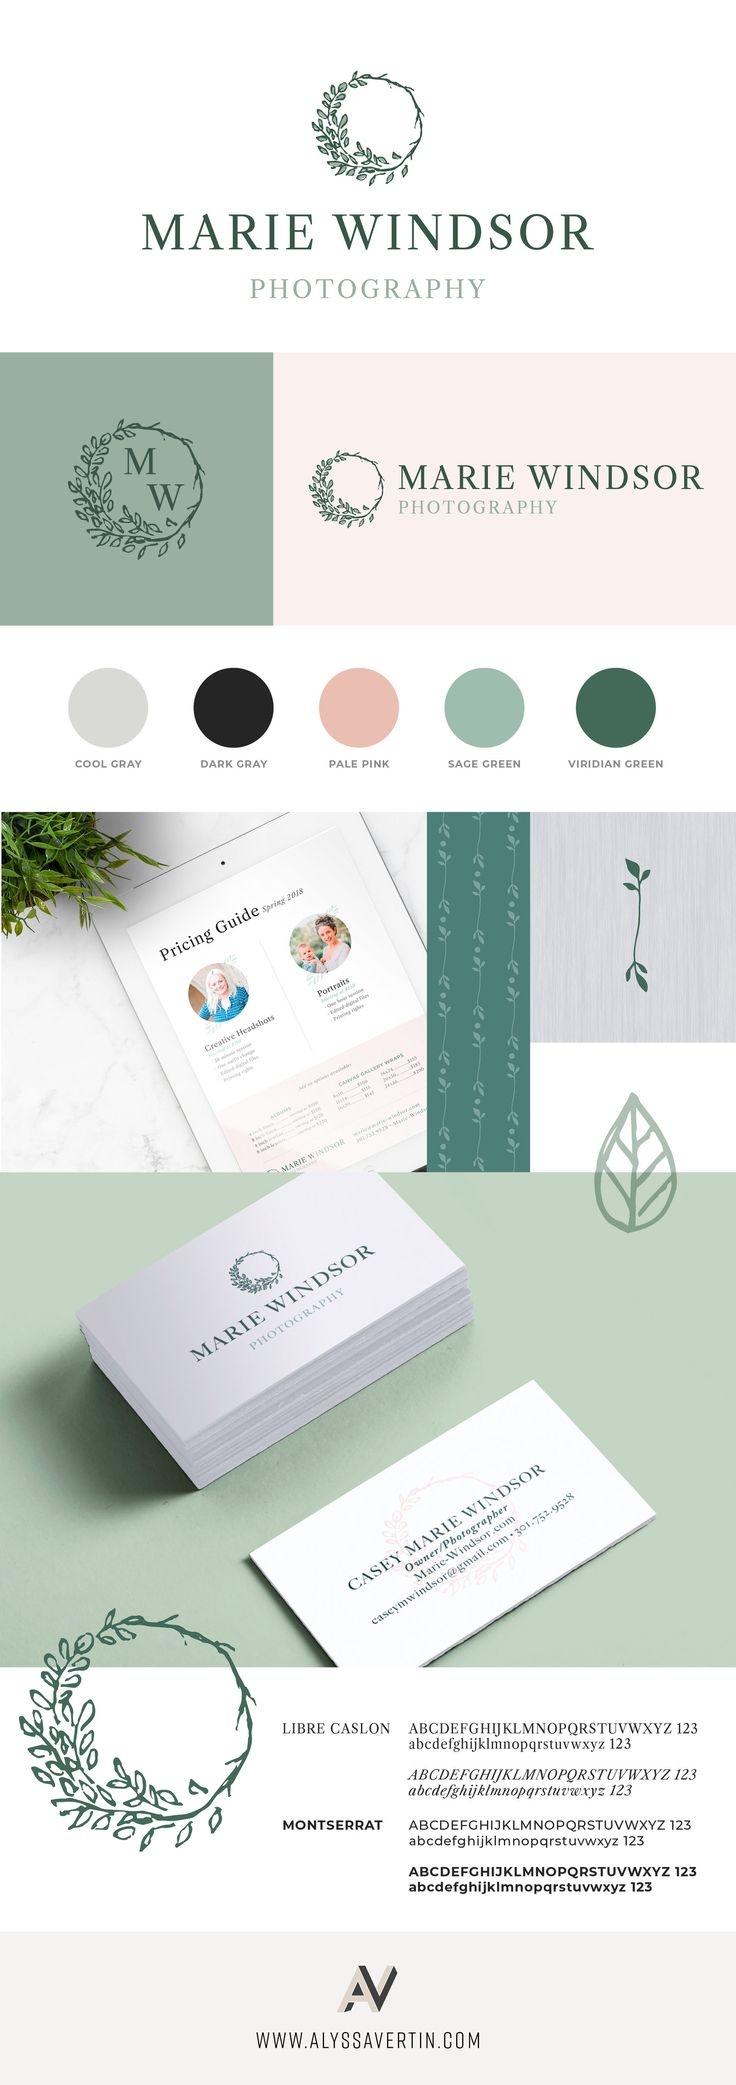 Alyssa Vertin Design | Branding and logo for Marie Windsor Photography